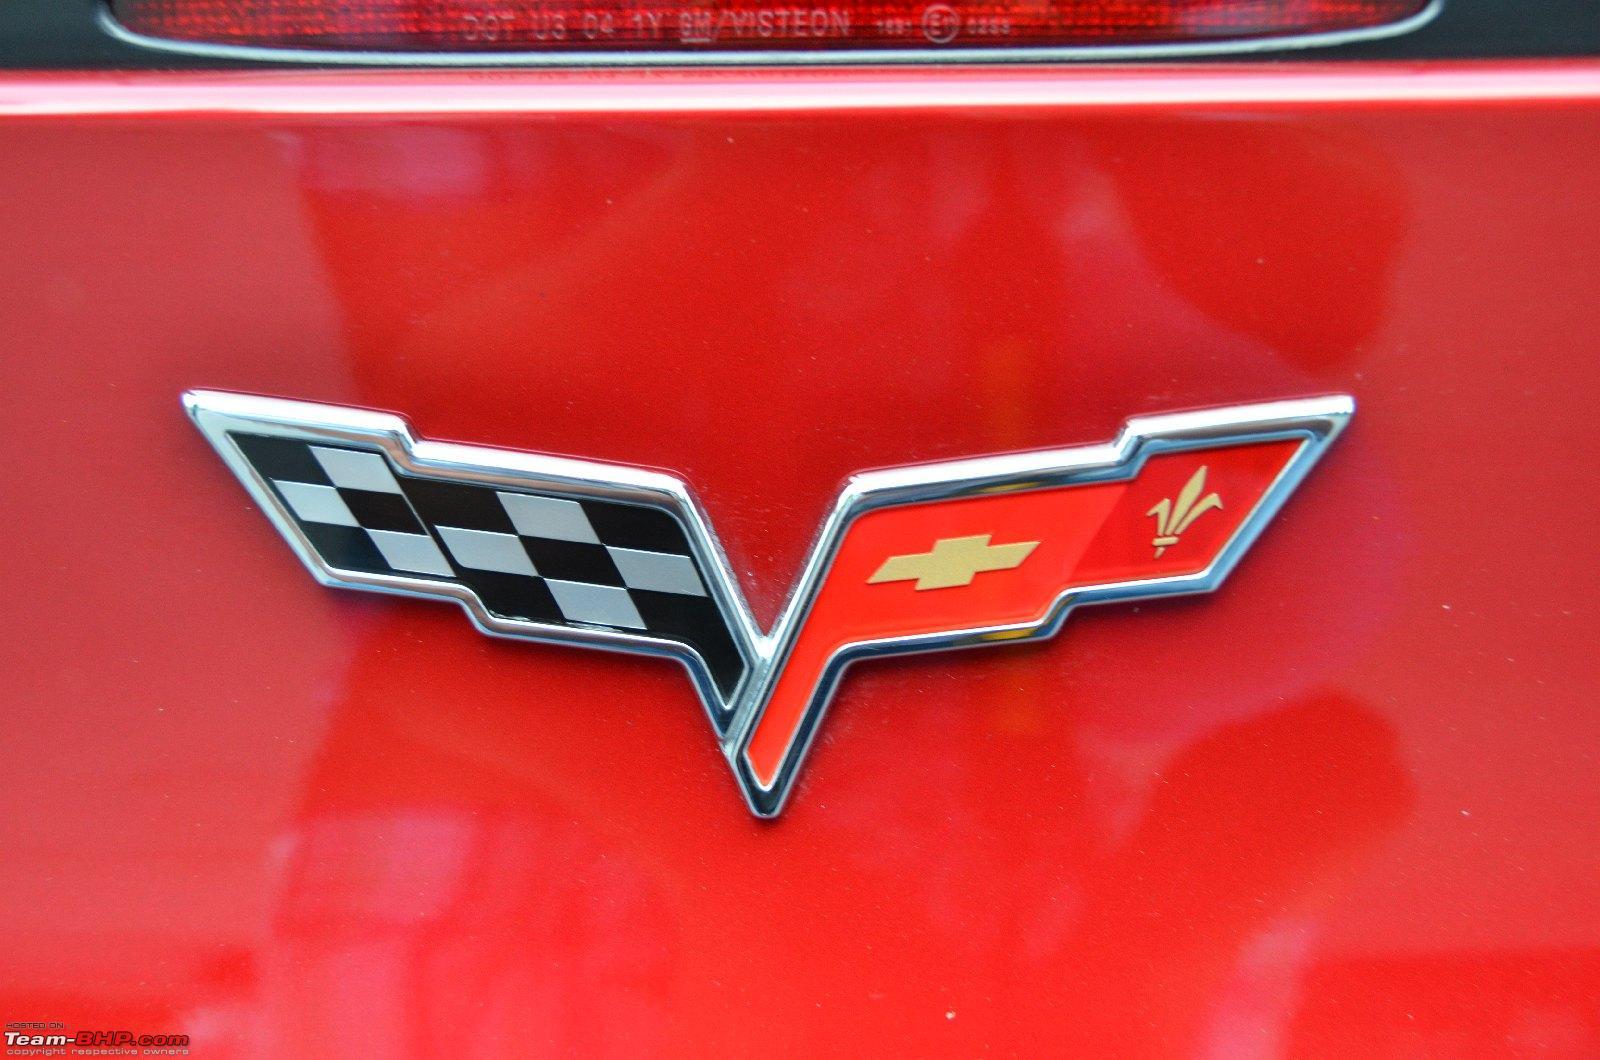 Chevy Sports Car Logos